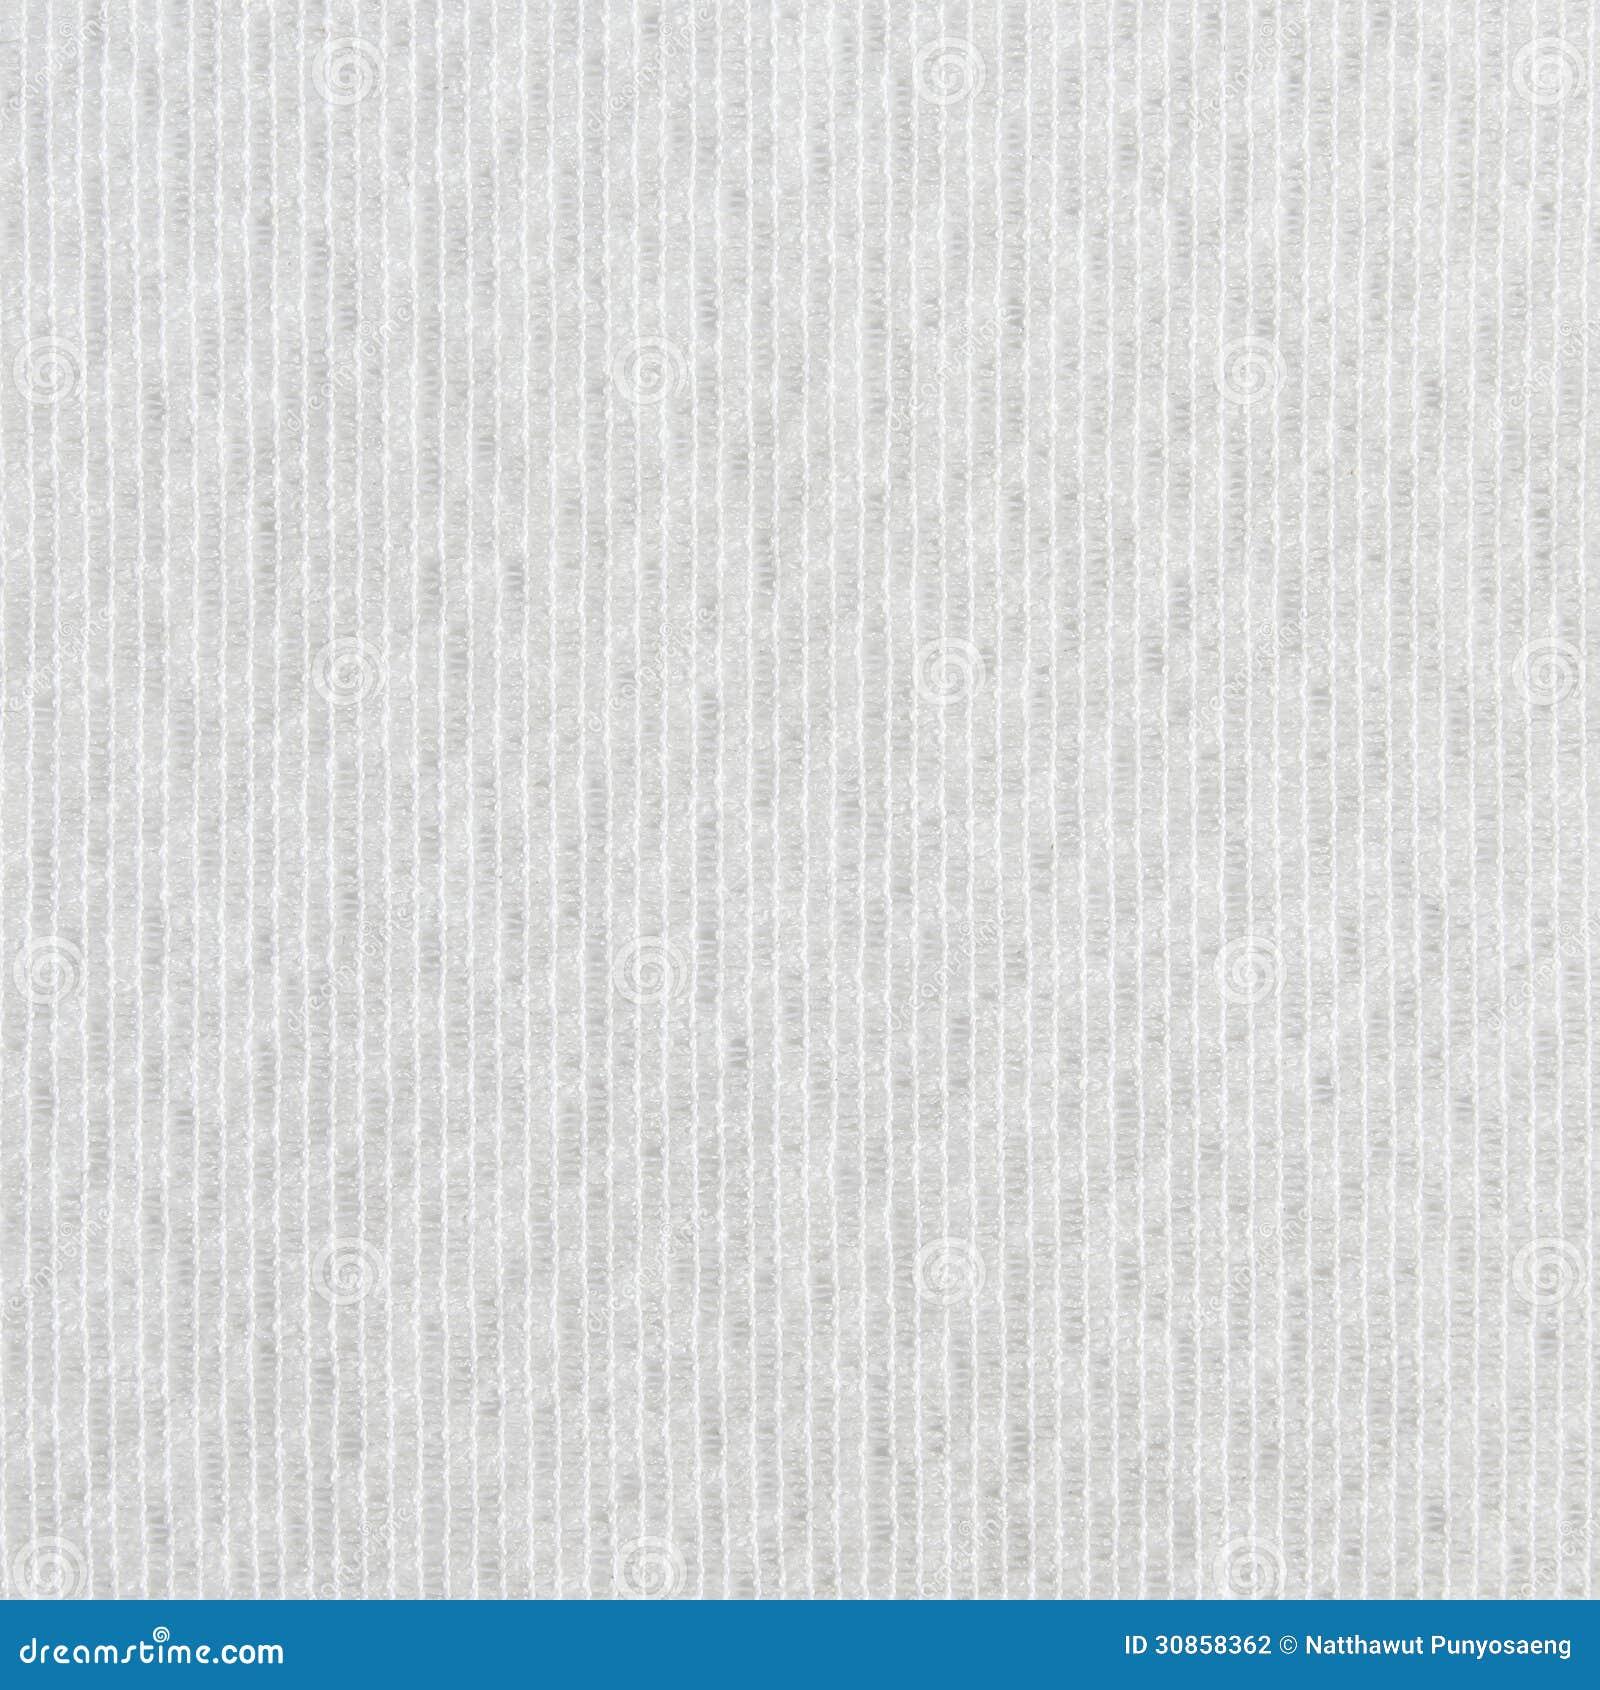 white cotton cloth background - photo #11